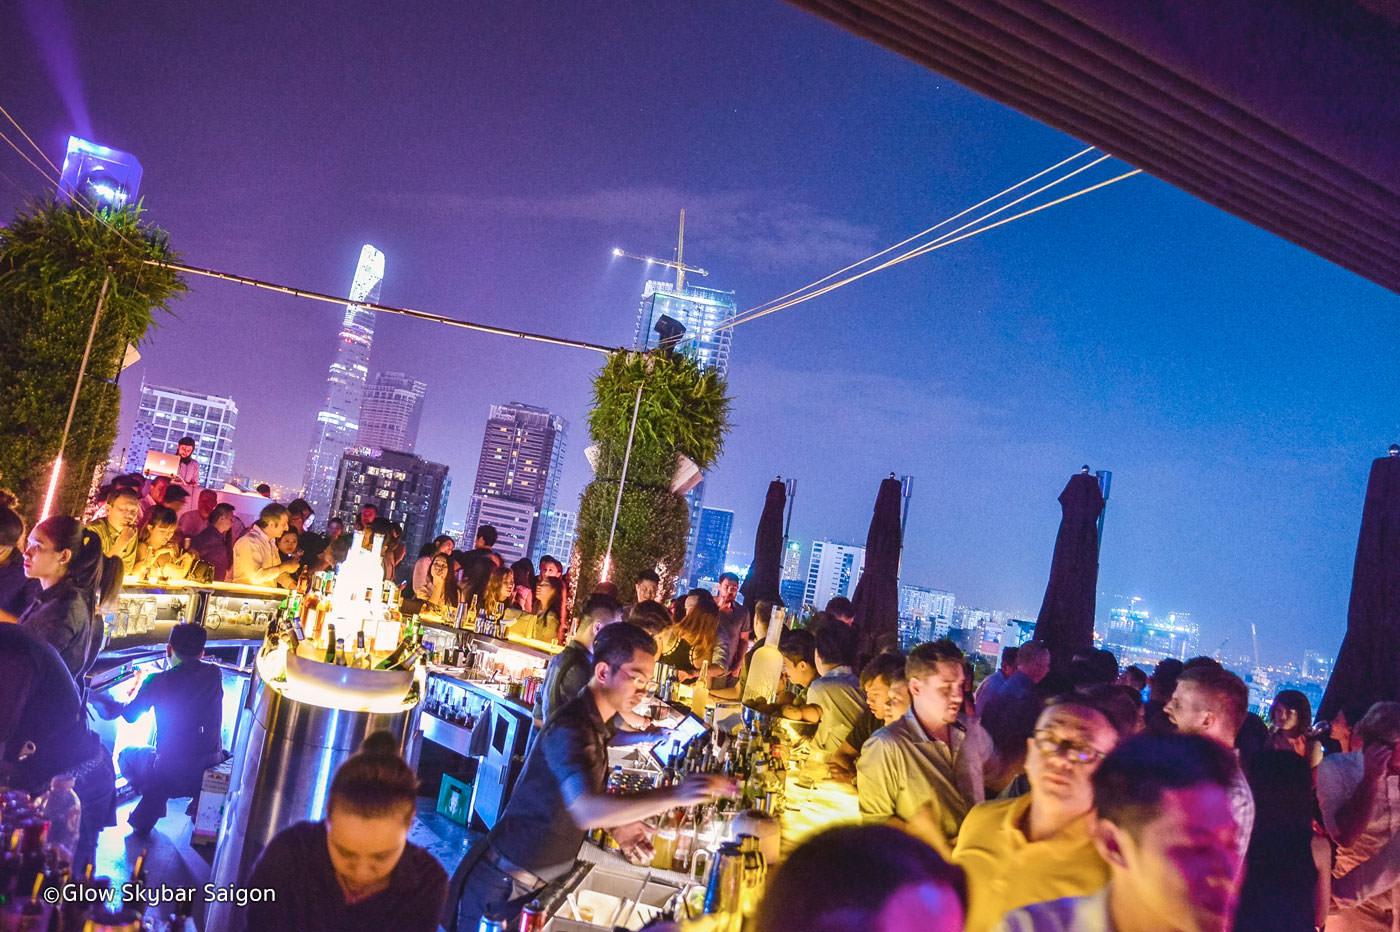 Quán bar Glow Skybar